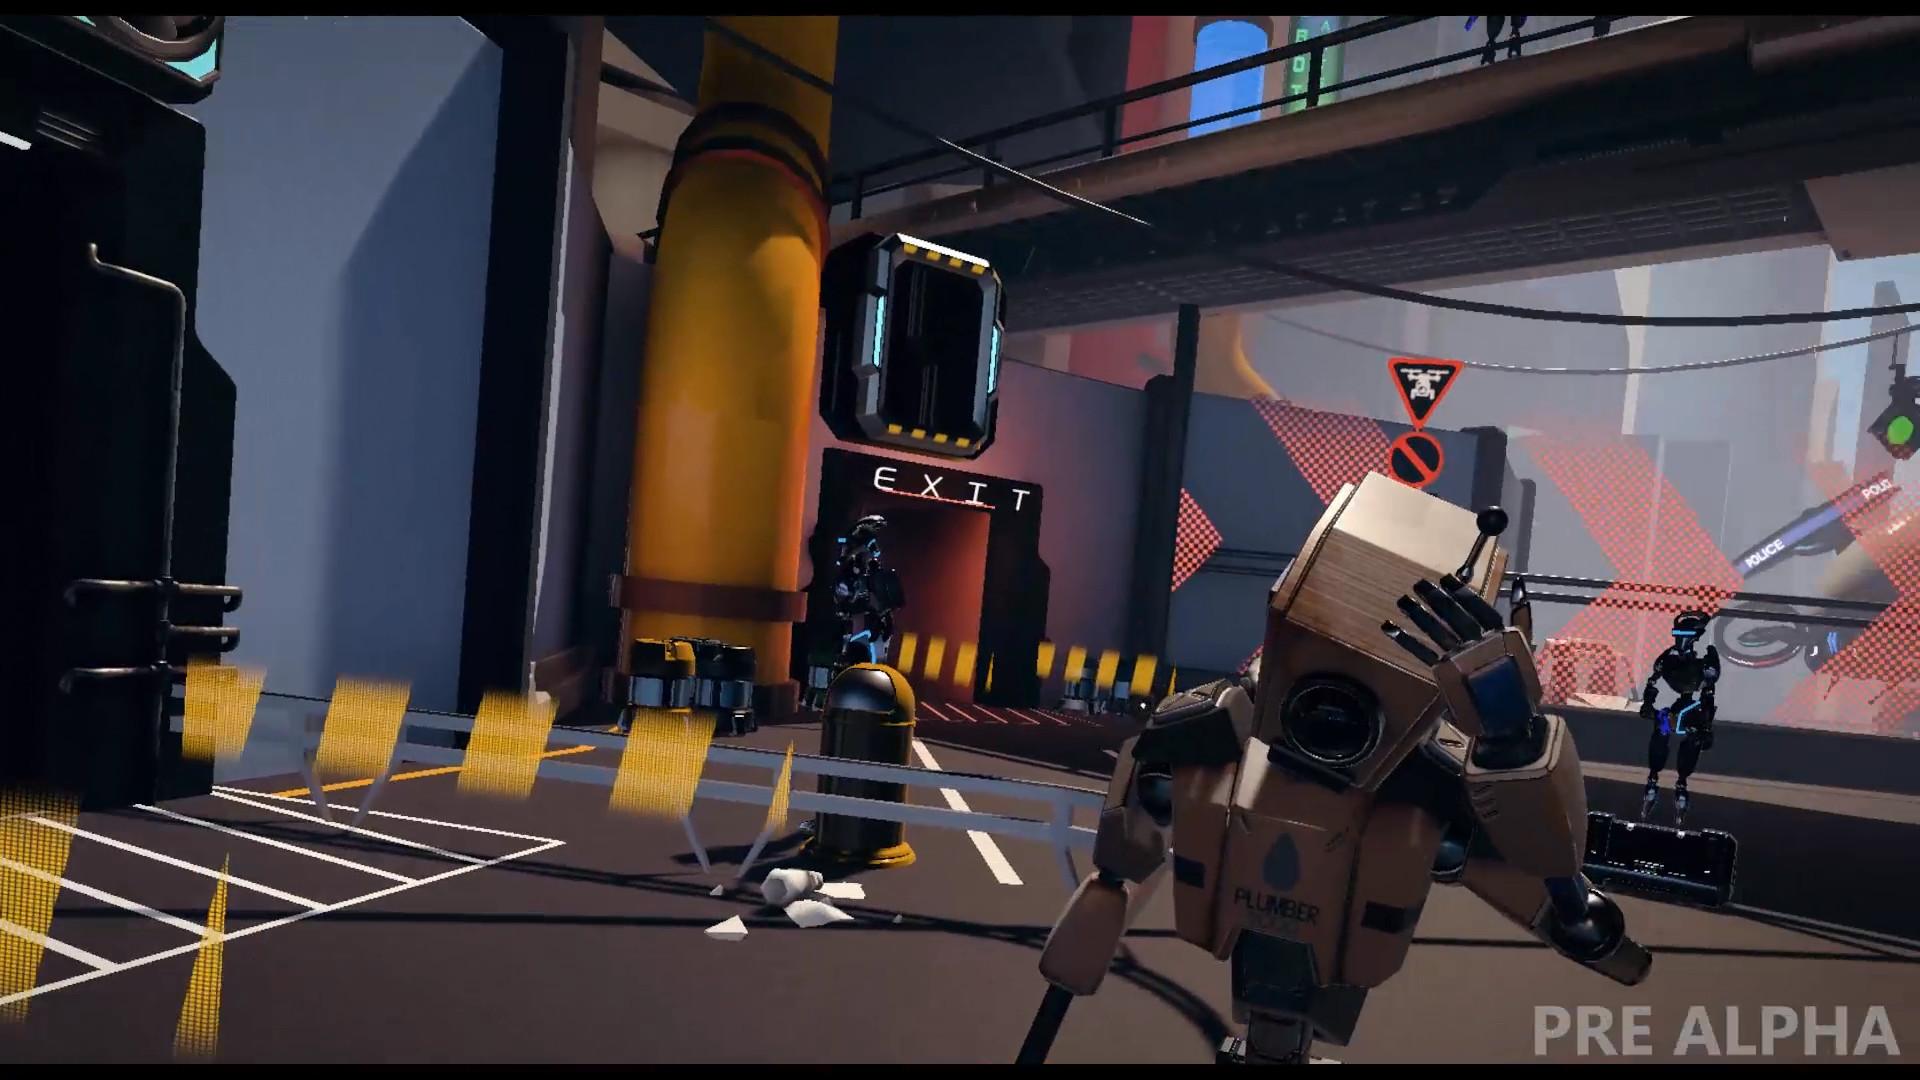 Border-Patrol-Steam-Oculus-Rift-HTC-Vive